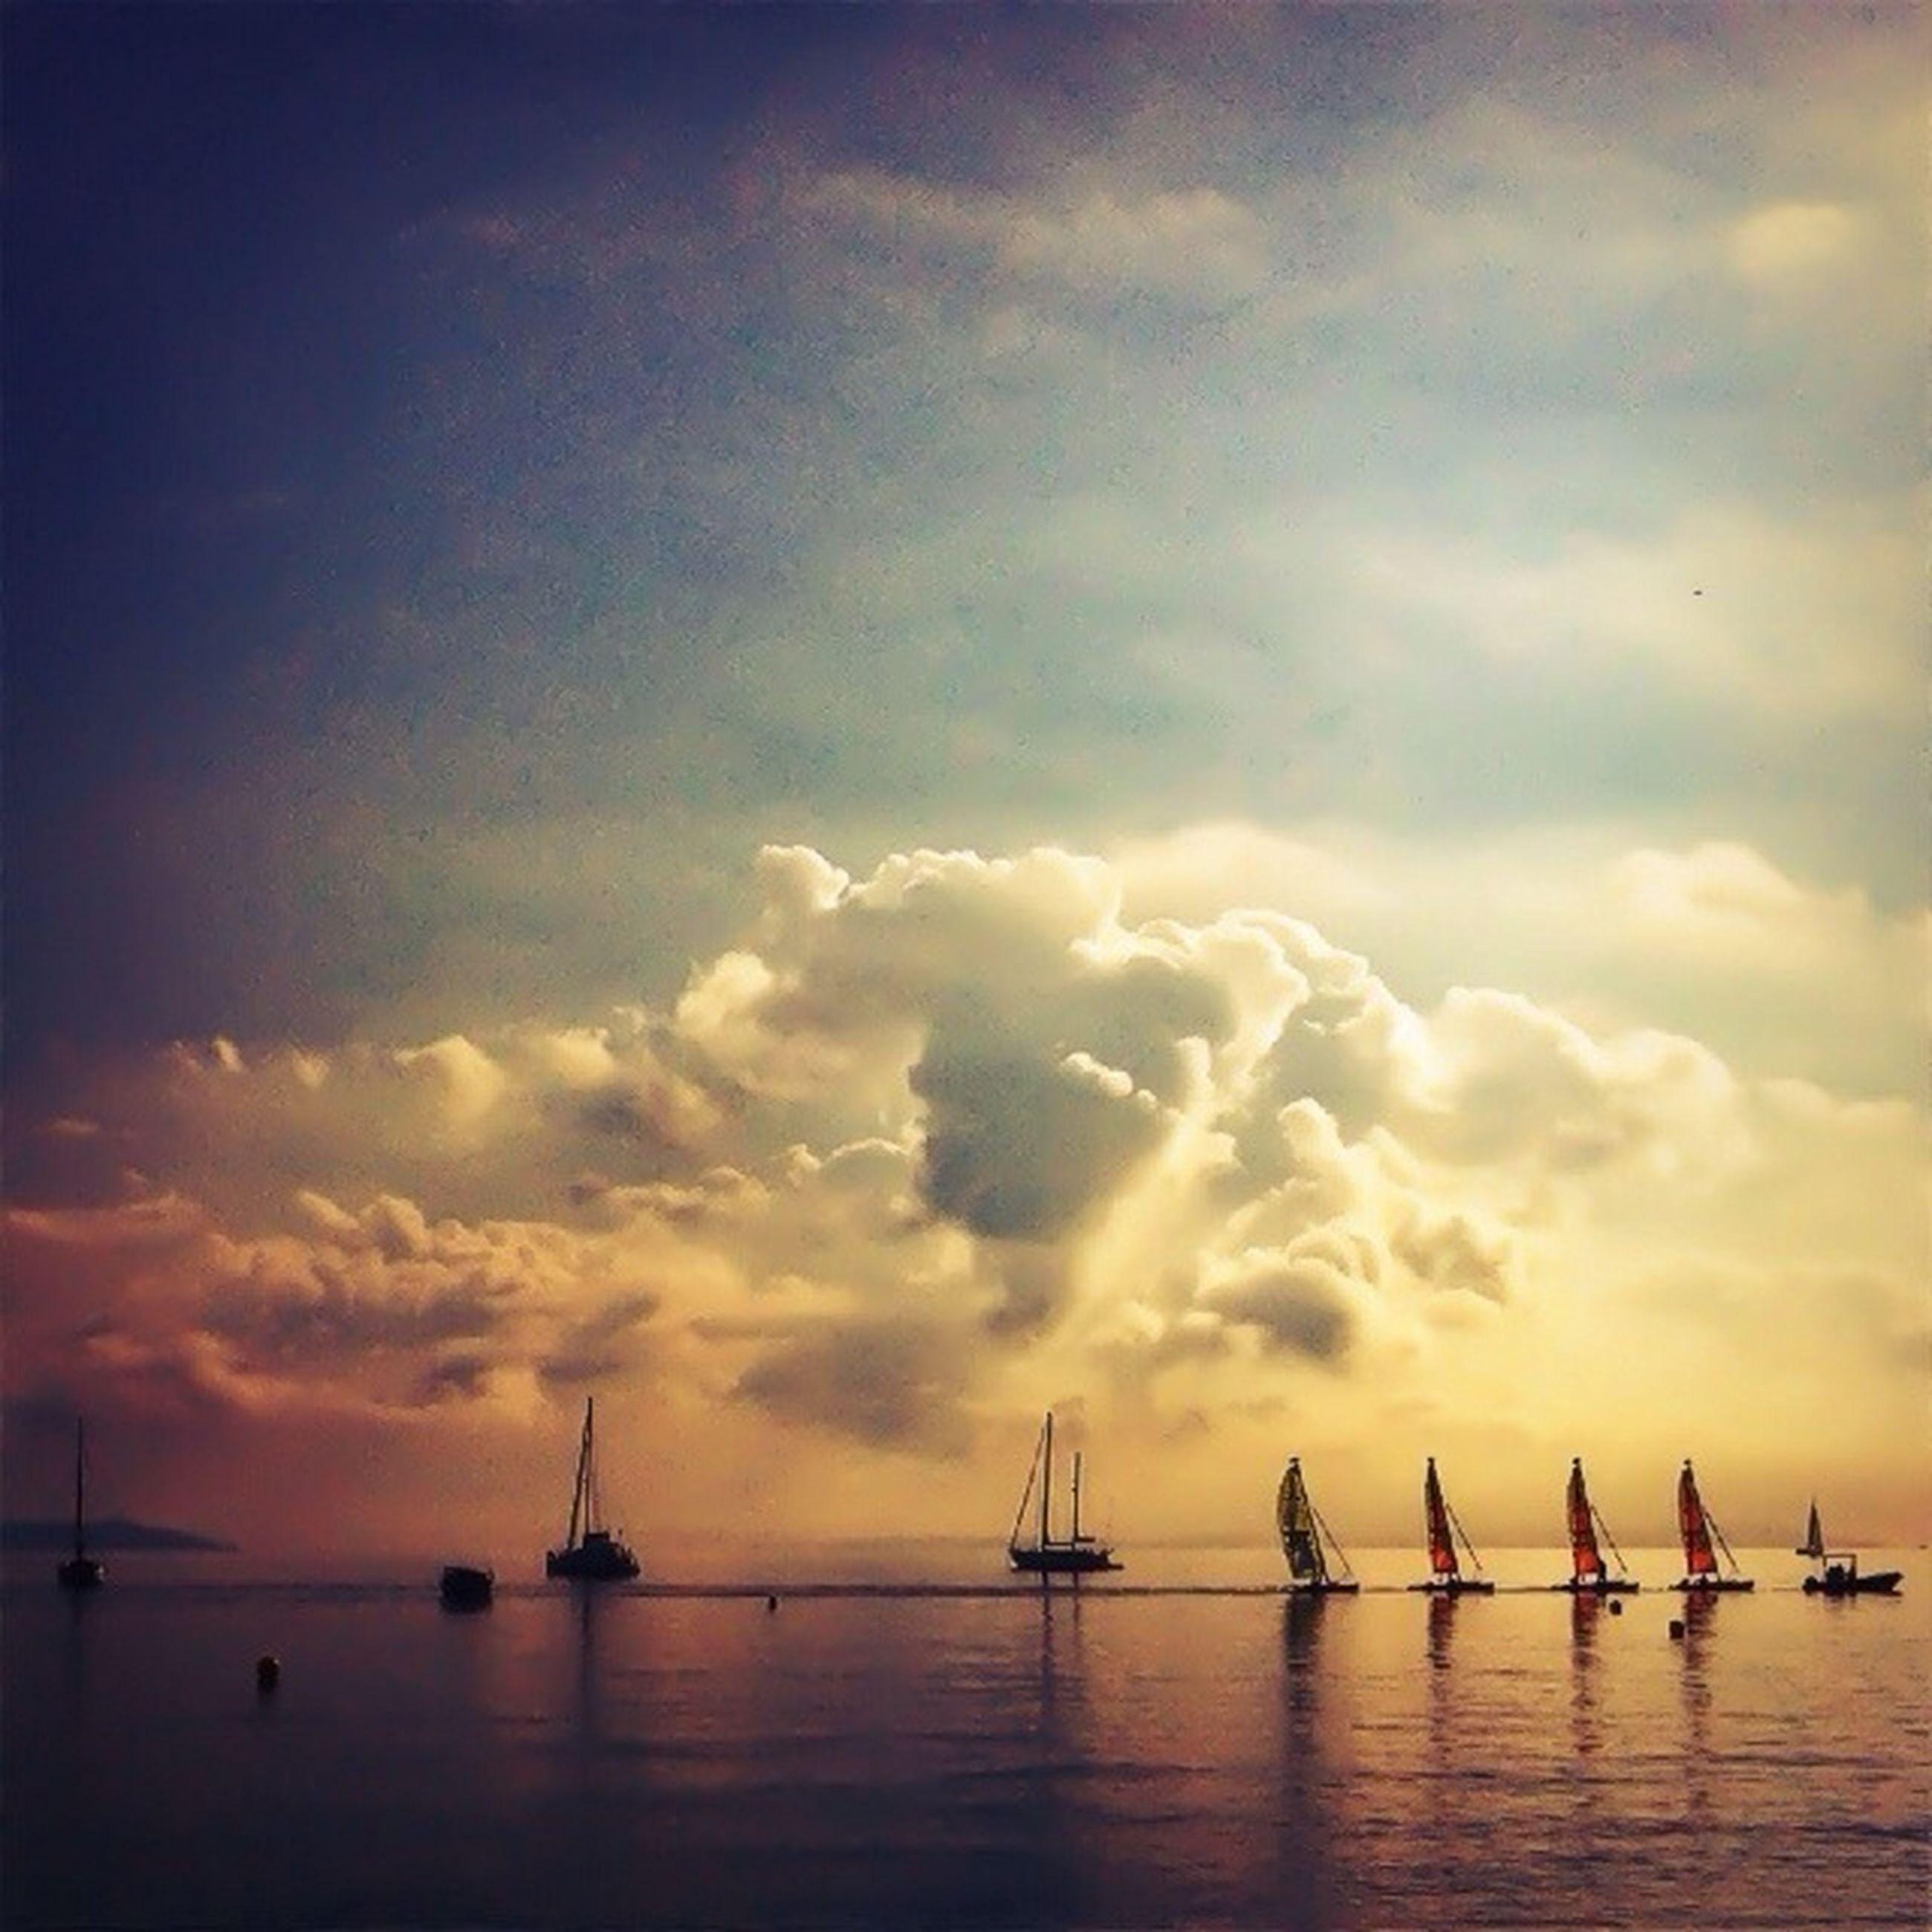 sunset, water, sea, sky, nautical vessel, waterfront, cloud - sky, boat, transportation, orange color, mode of transport, scenics, silhouette, beauty in nature, tranquility, tranquil scene, nature, cloud, sailboat, idyllic